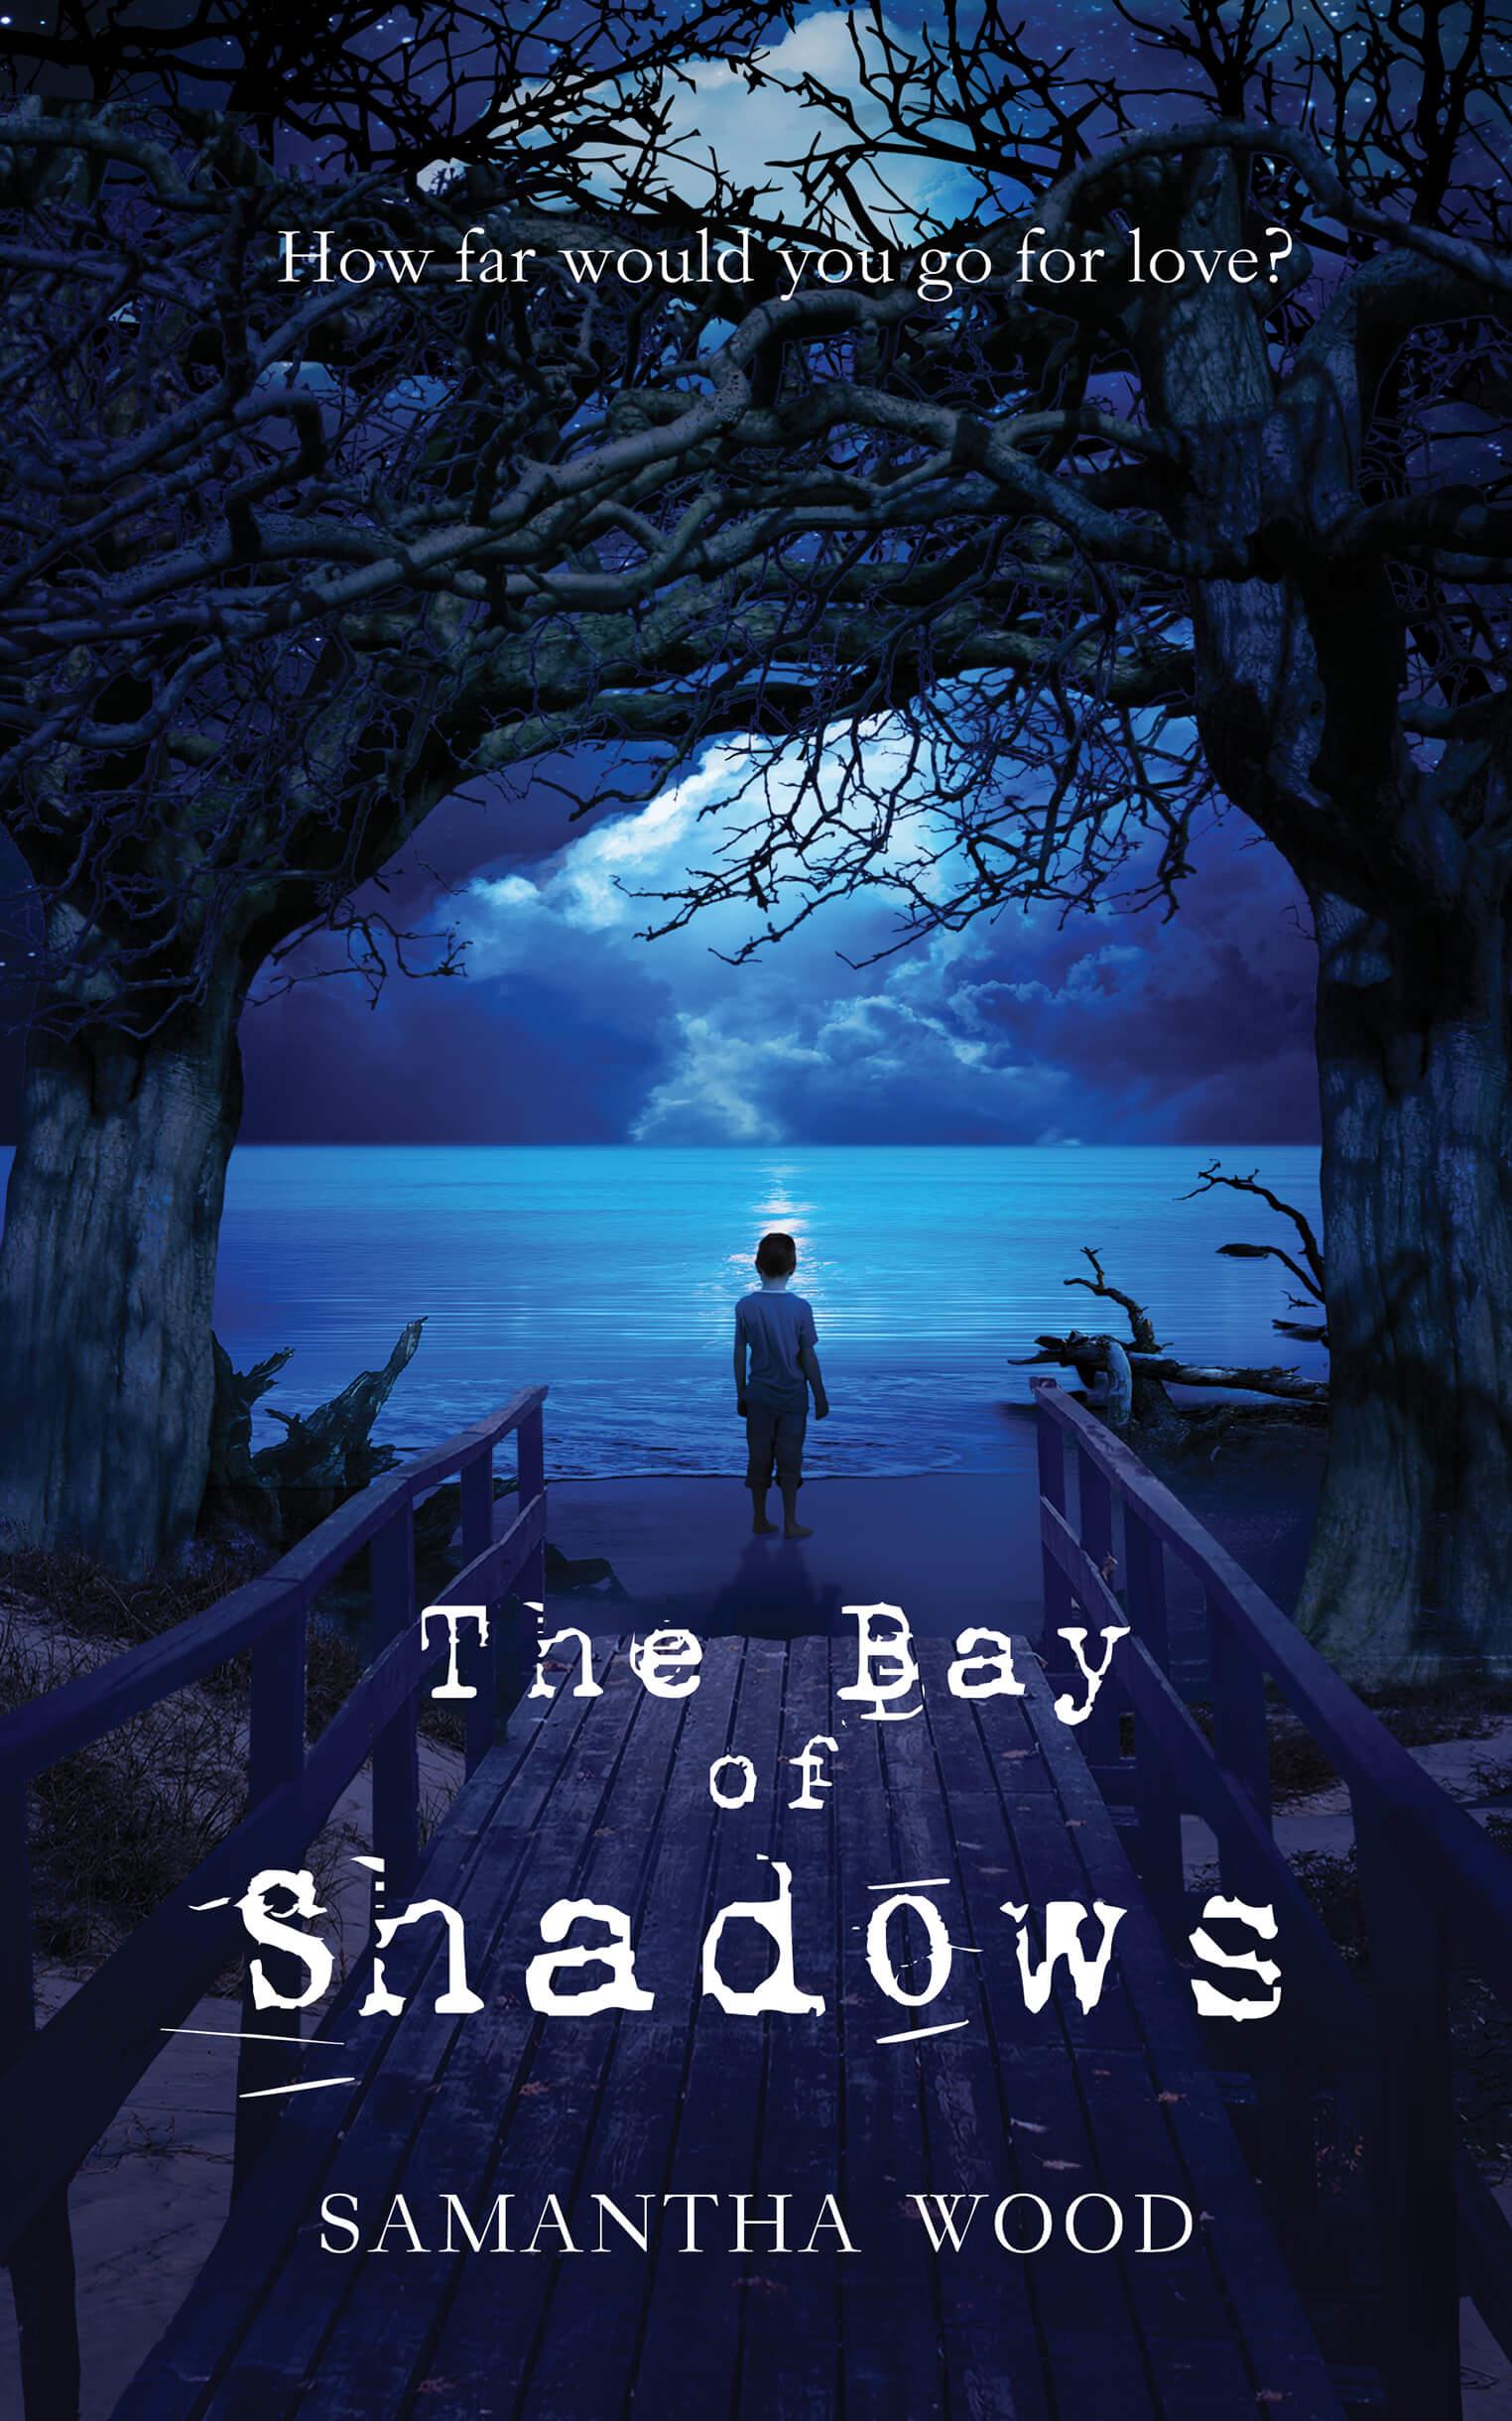 The Bay of Shadows by Samantha Wood